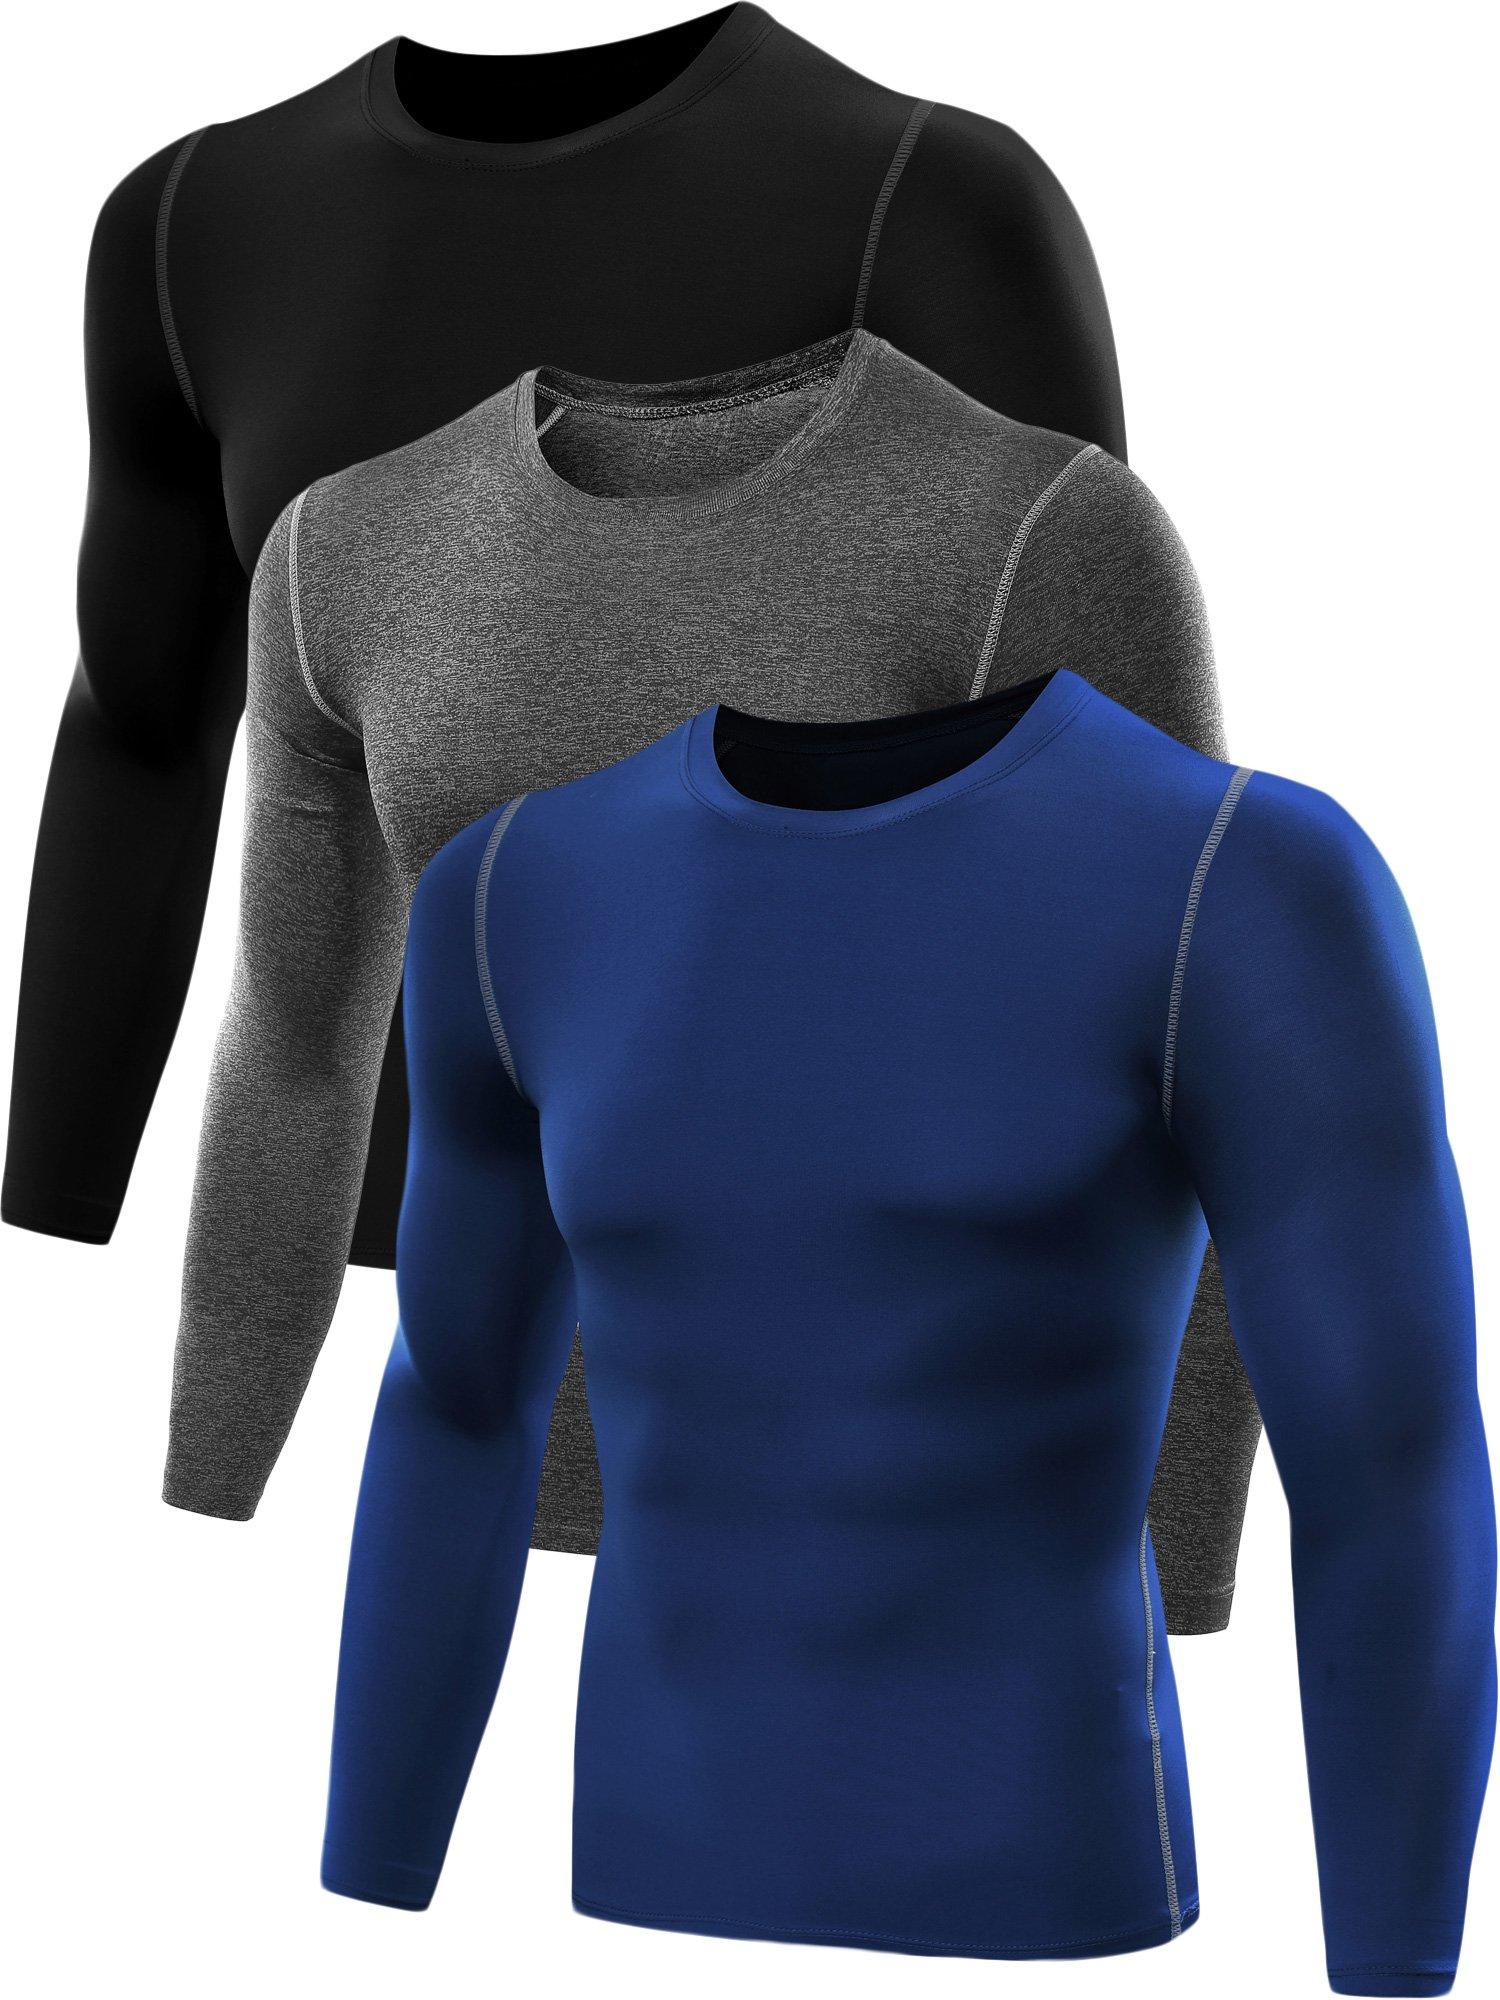 Neleus Men's 3 Pack Athletic Compression Sport Running T Shirt Long Sleeve Base Layer,Black,Grey,Blue,US S,EU M